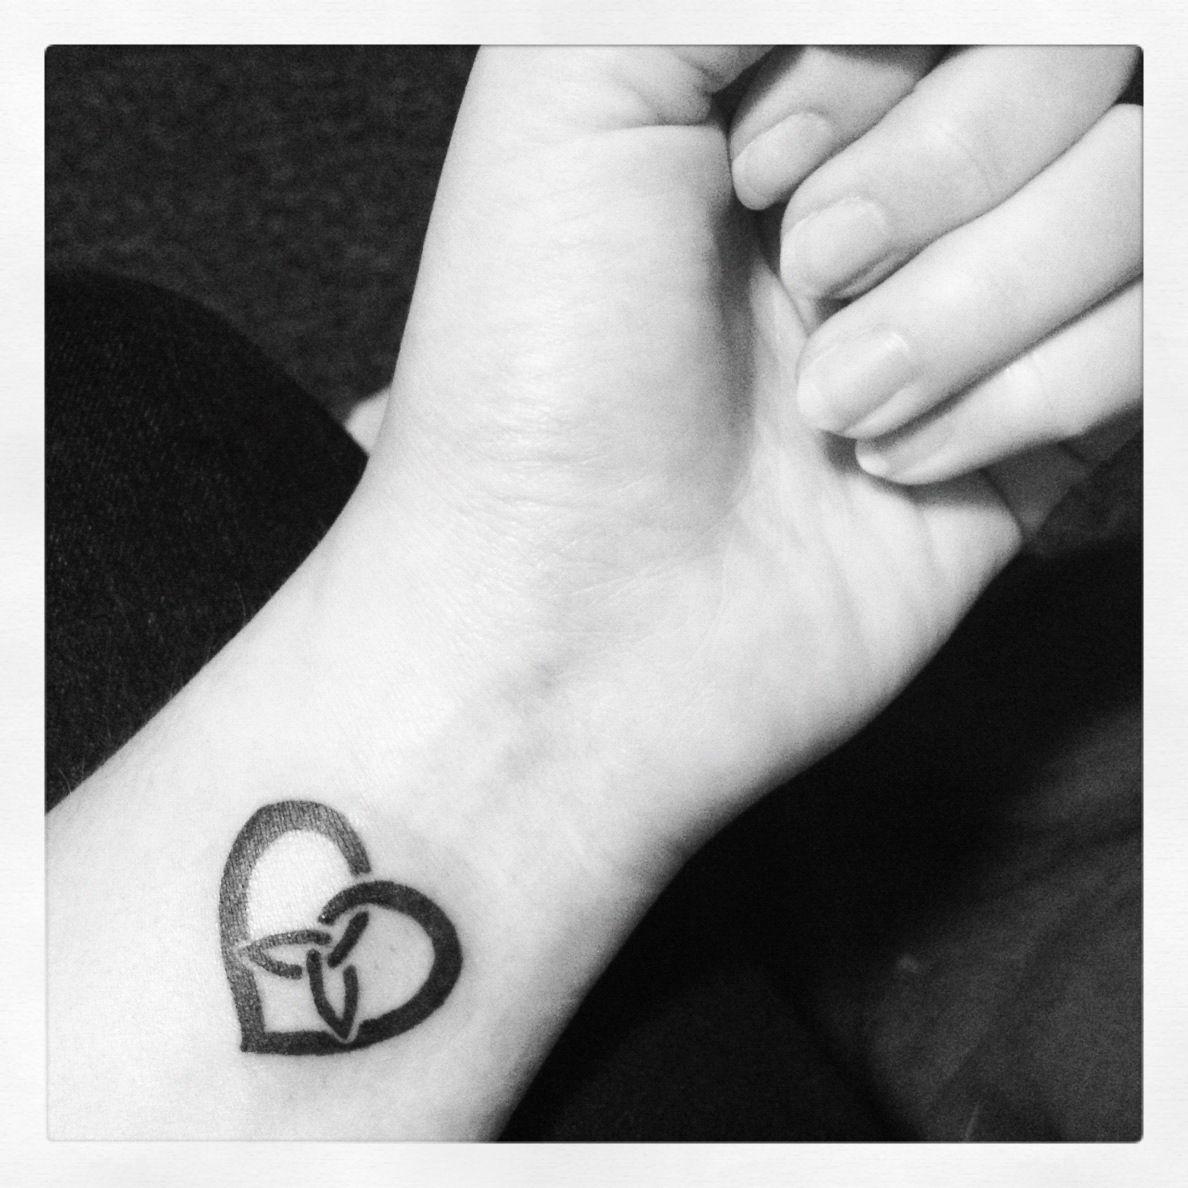 Heart, with trinity symbol...sister tat ideas with lysh